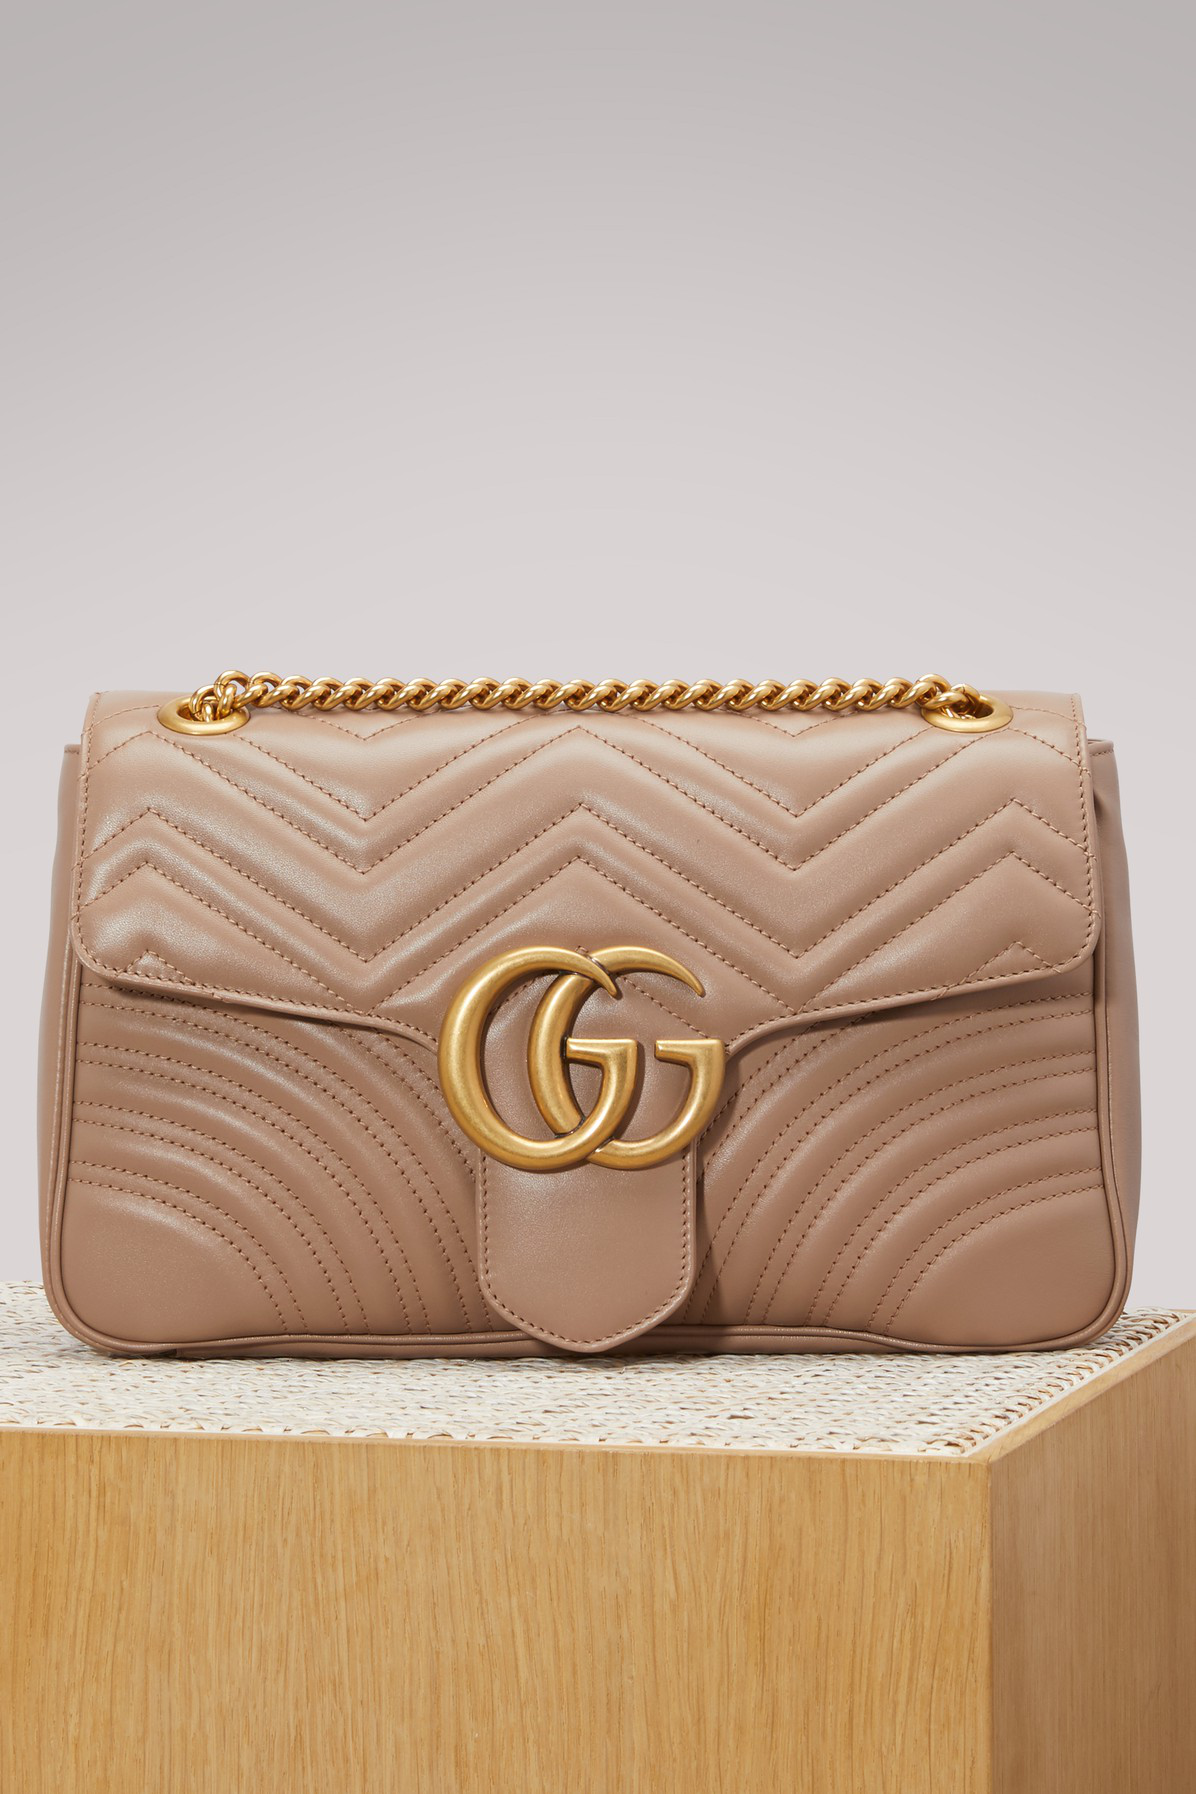 Gucci Gg Marmont MatelassÉ Shoulder Bag In Pink